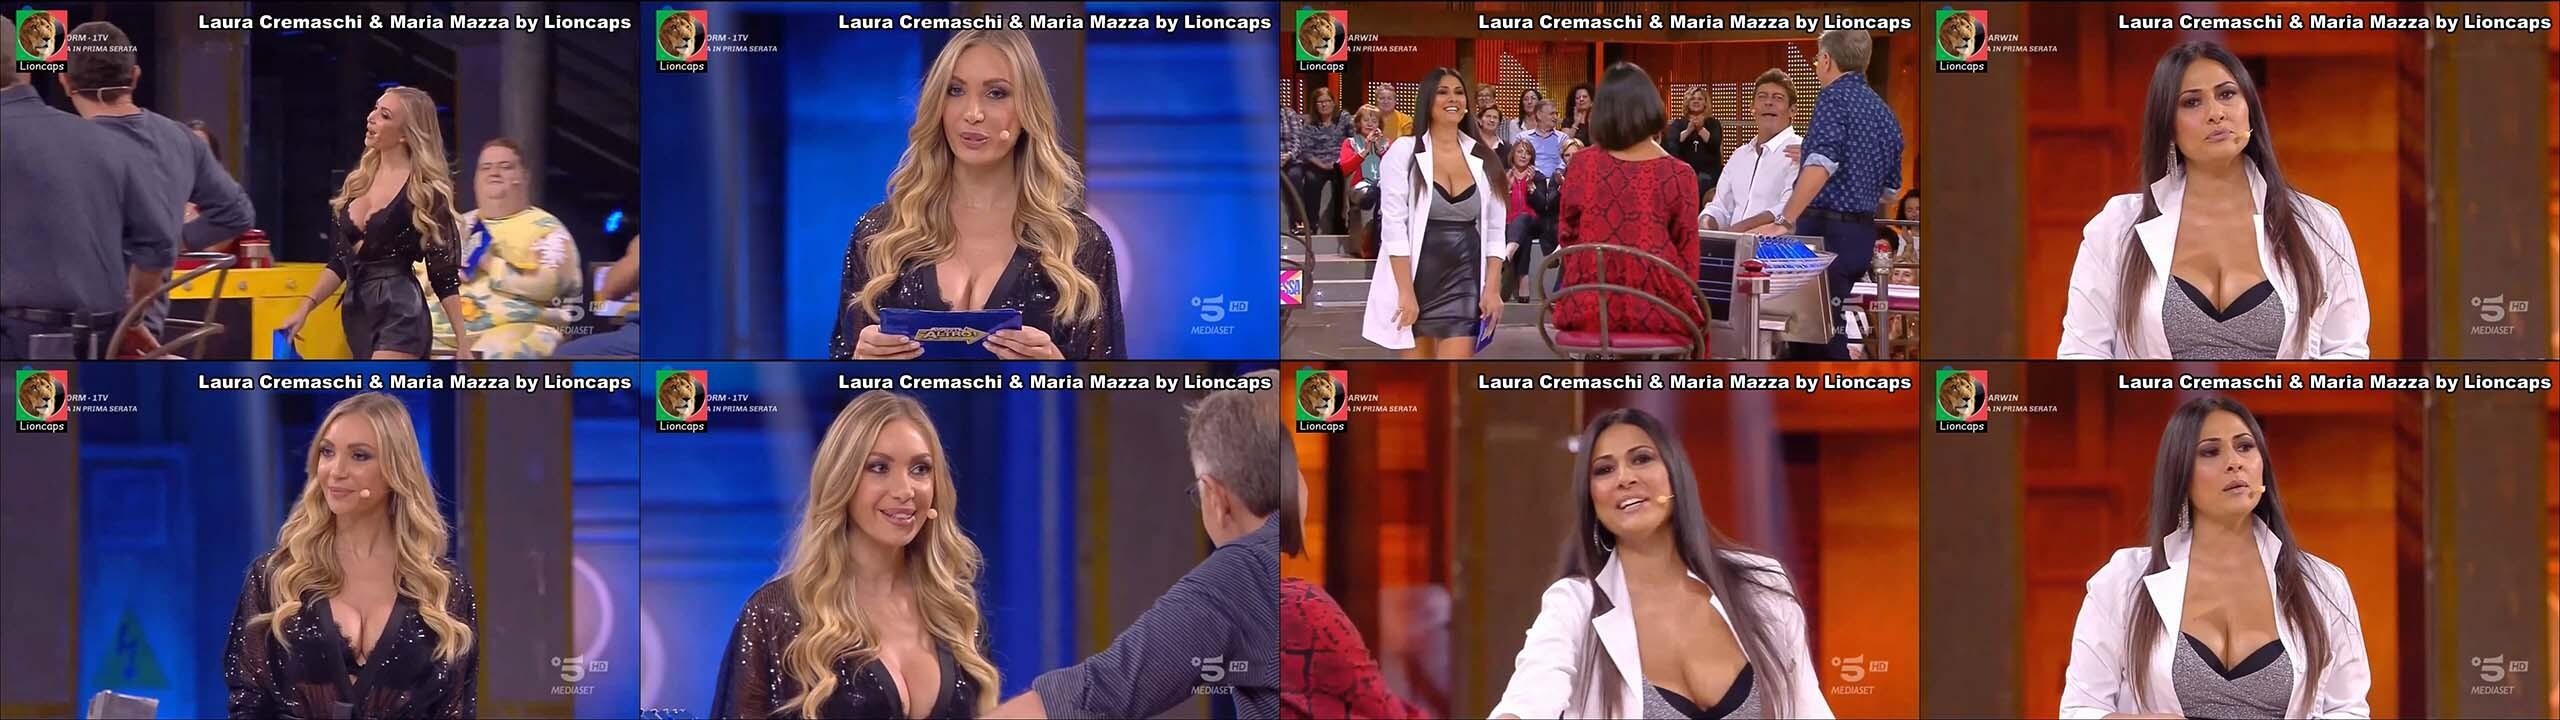 laura_cremaschi_maria_mazza_avanti_un_altro_lioncaps_06_05_2020_03.jpg